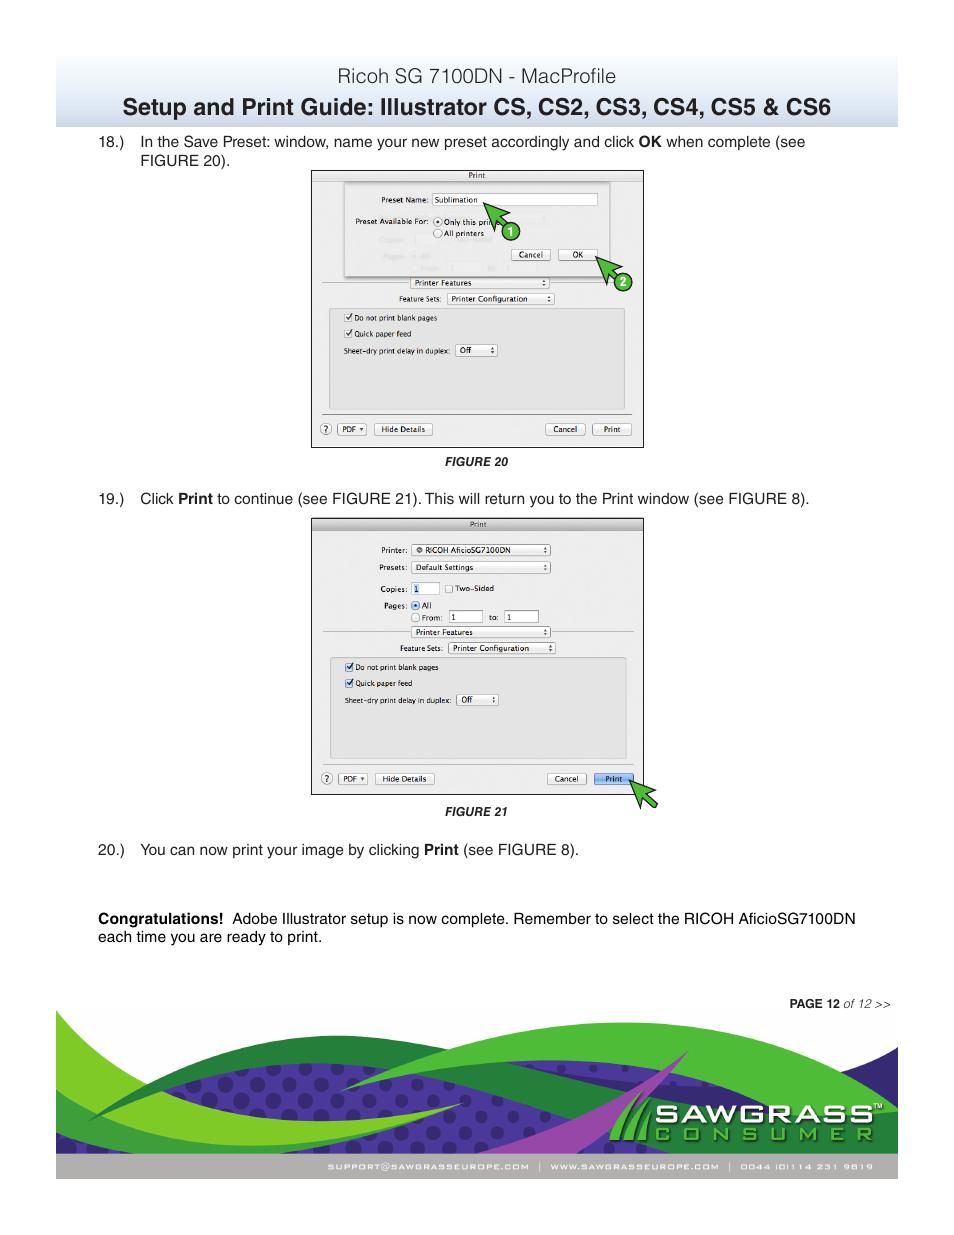 Ricoh sg 7100dn - macprofile | Xpres SubliJet R Ricoh